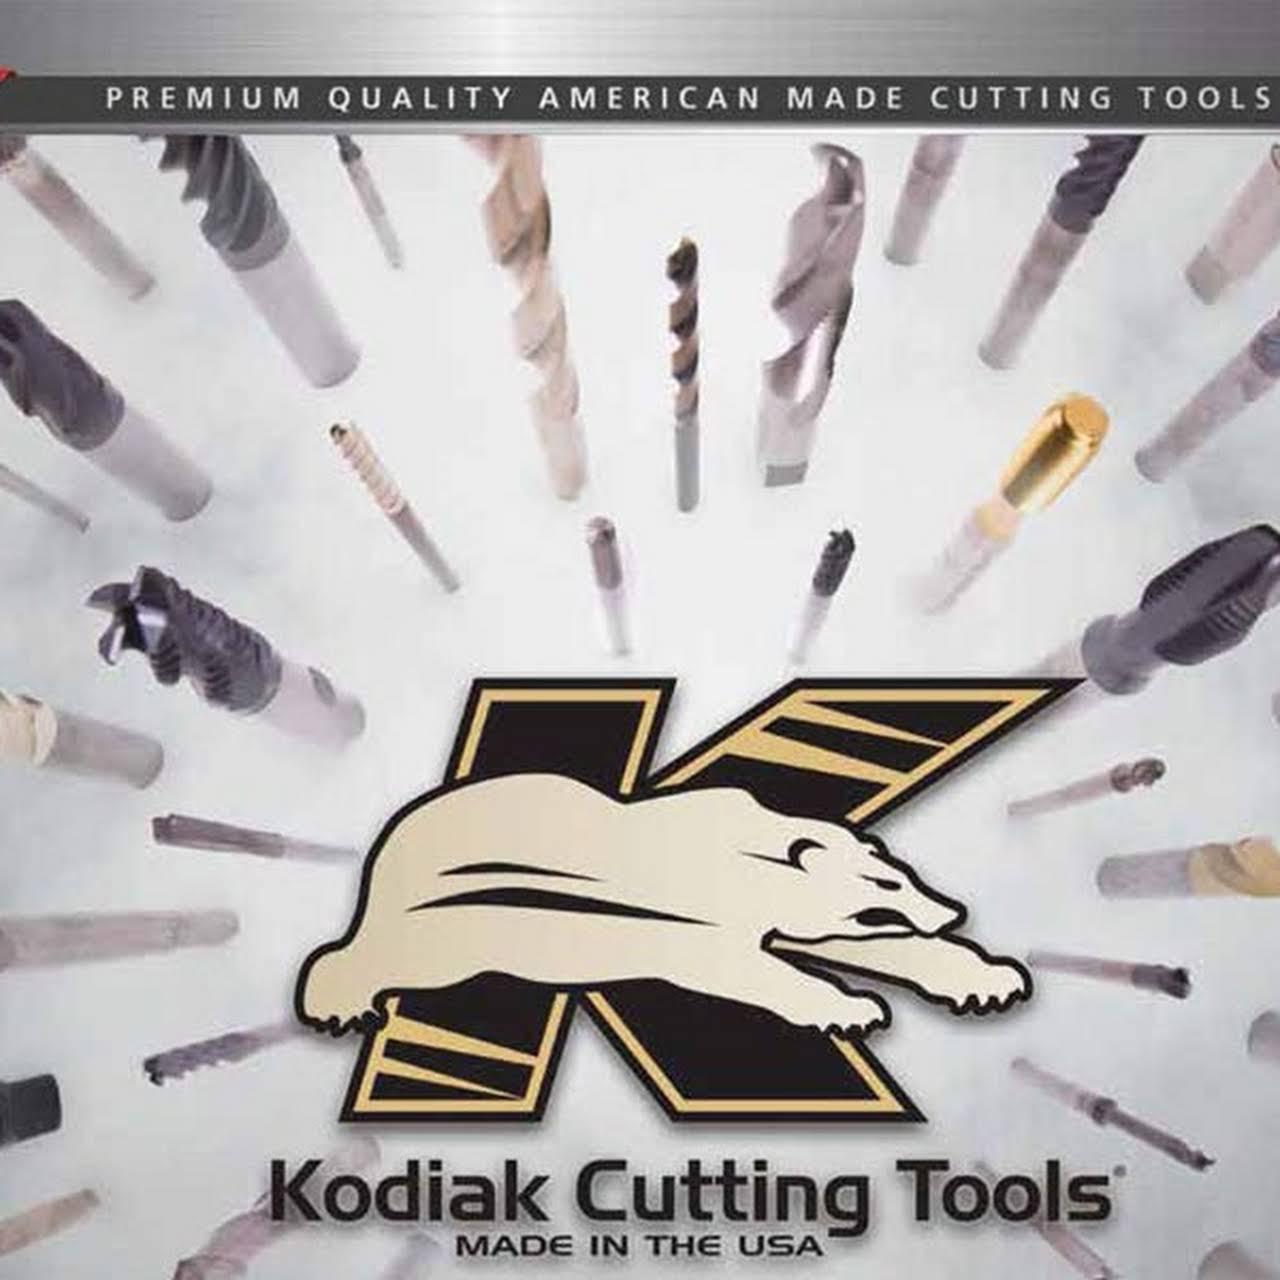 3//4 Diameter Single Flute 82 Degree Kodiak Cutting Tools KCT118996 USA Made Solid Carbide Countersink